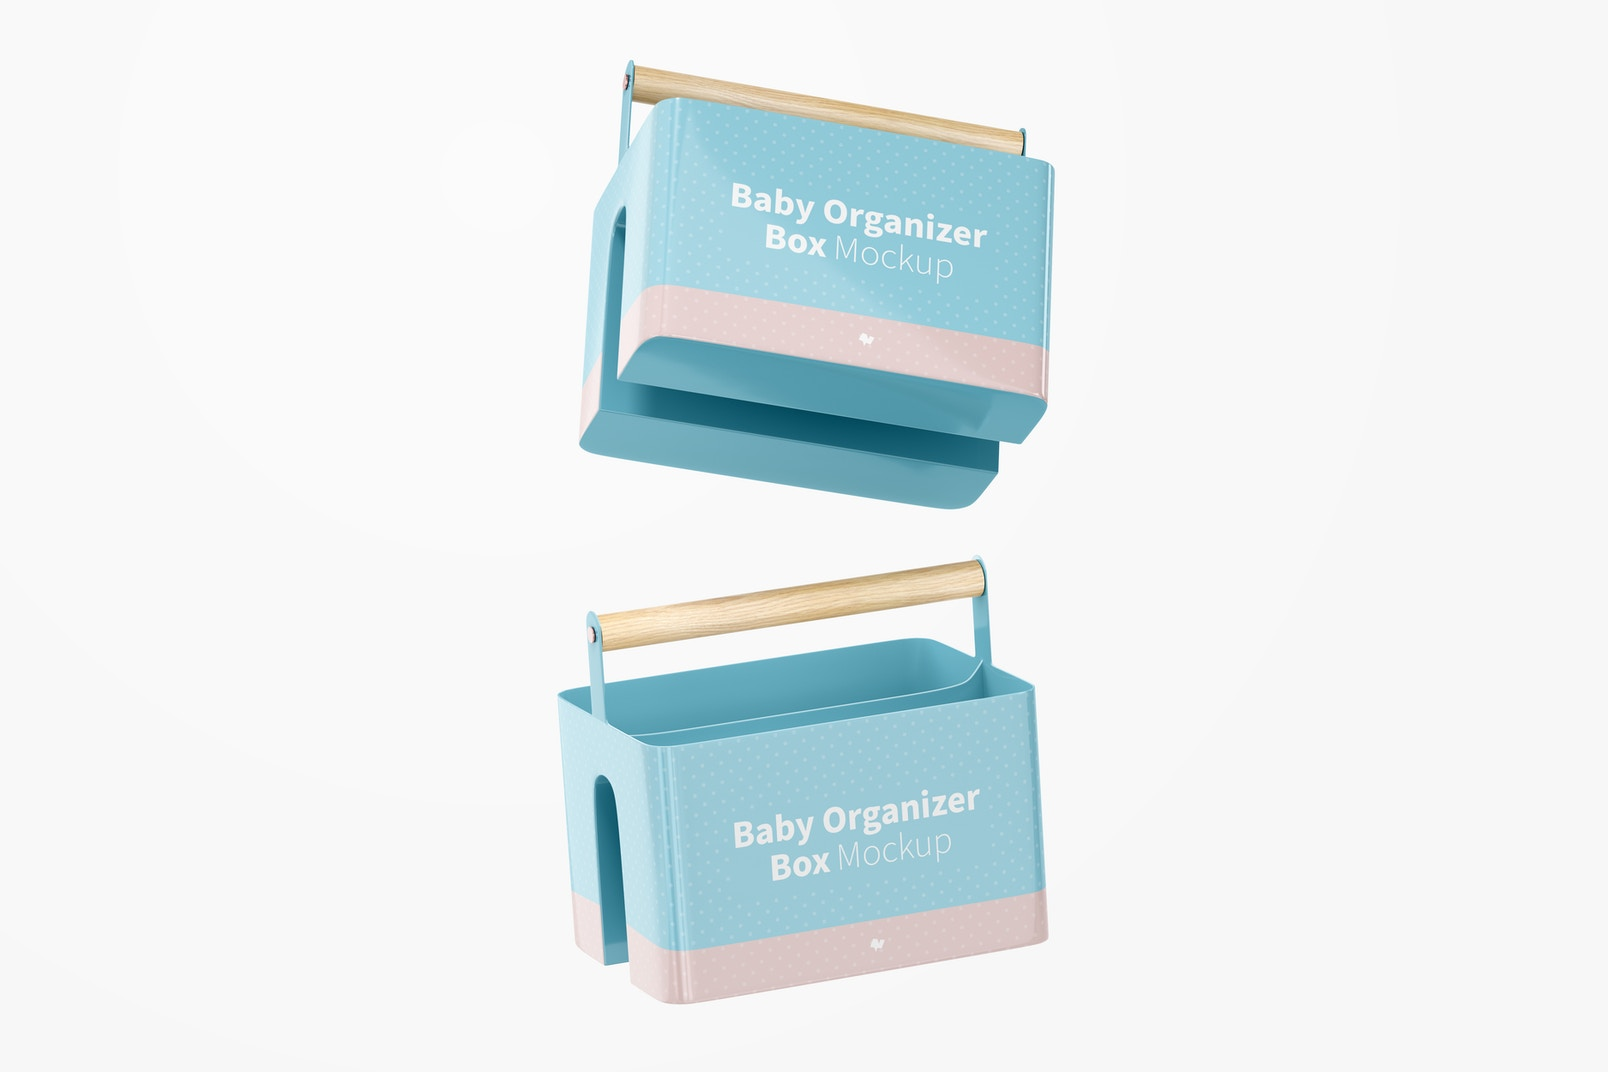 Baby Organizer Box Mockup, Floating